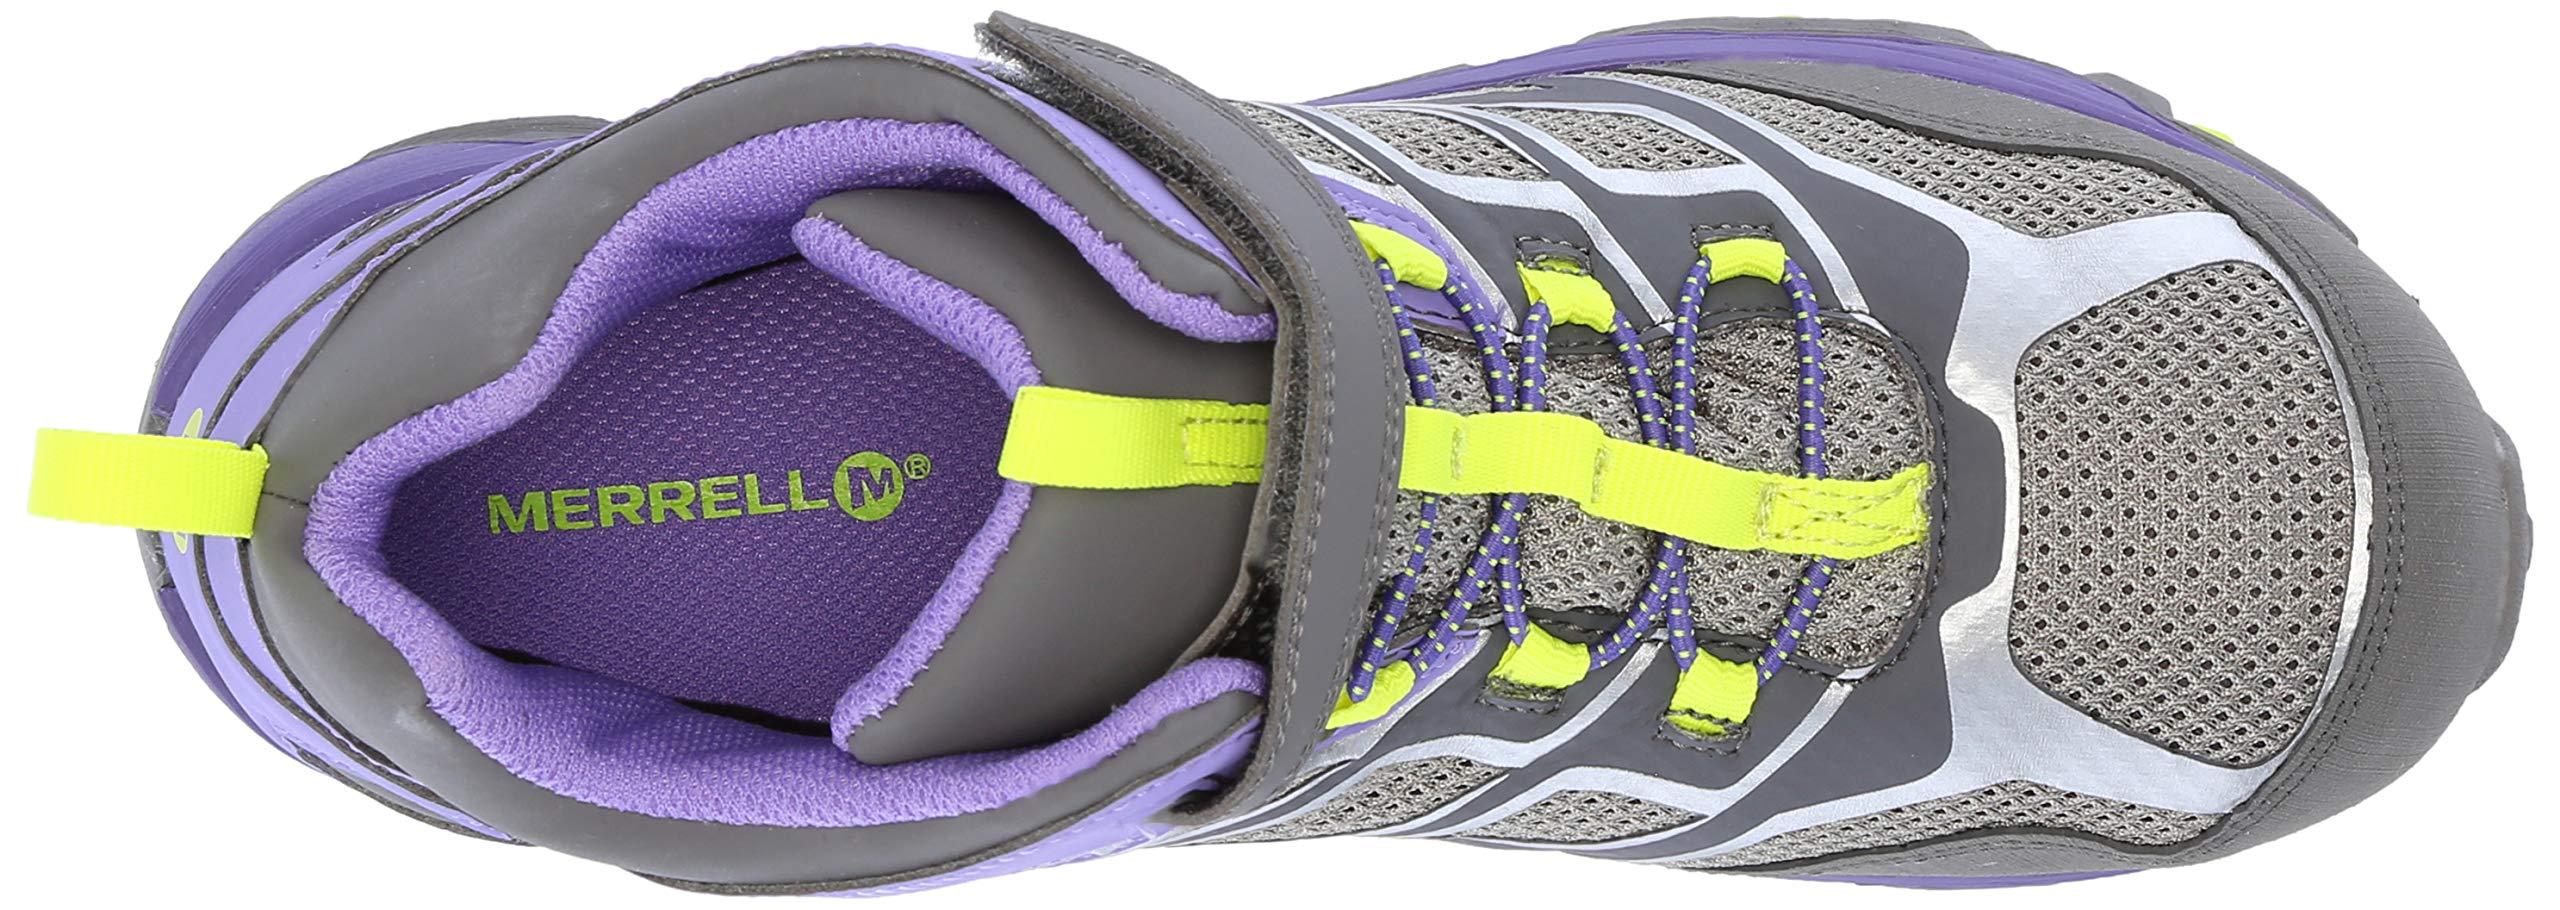 Merrell Girls' Moab FST Mid A/C WTRPF Hiking Shoe, Grey/Purple, 3.5 Medium US Big Kid by Merrell (Image #8)